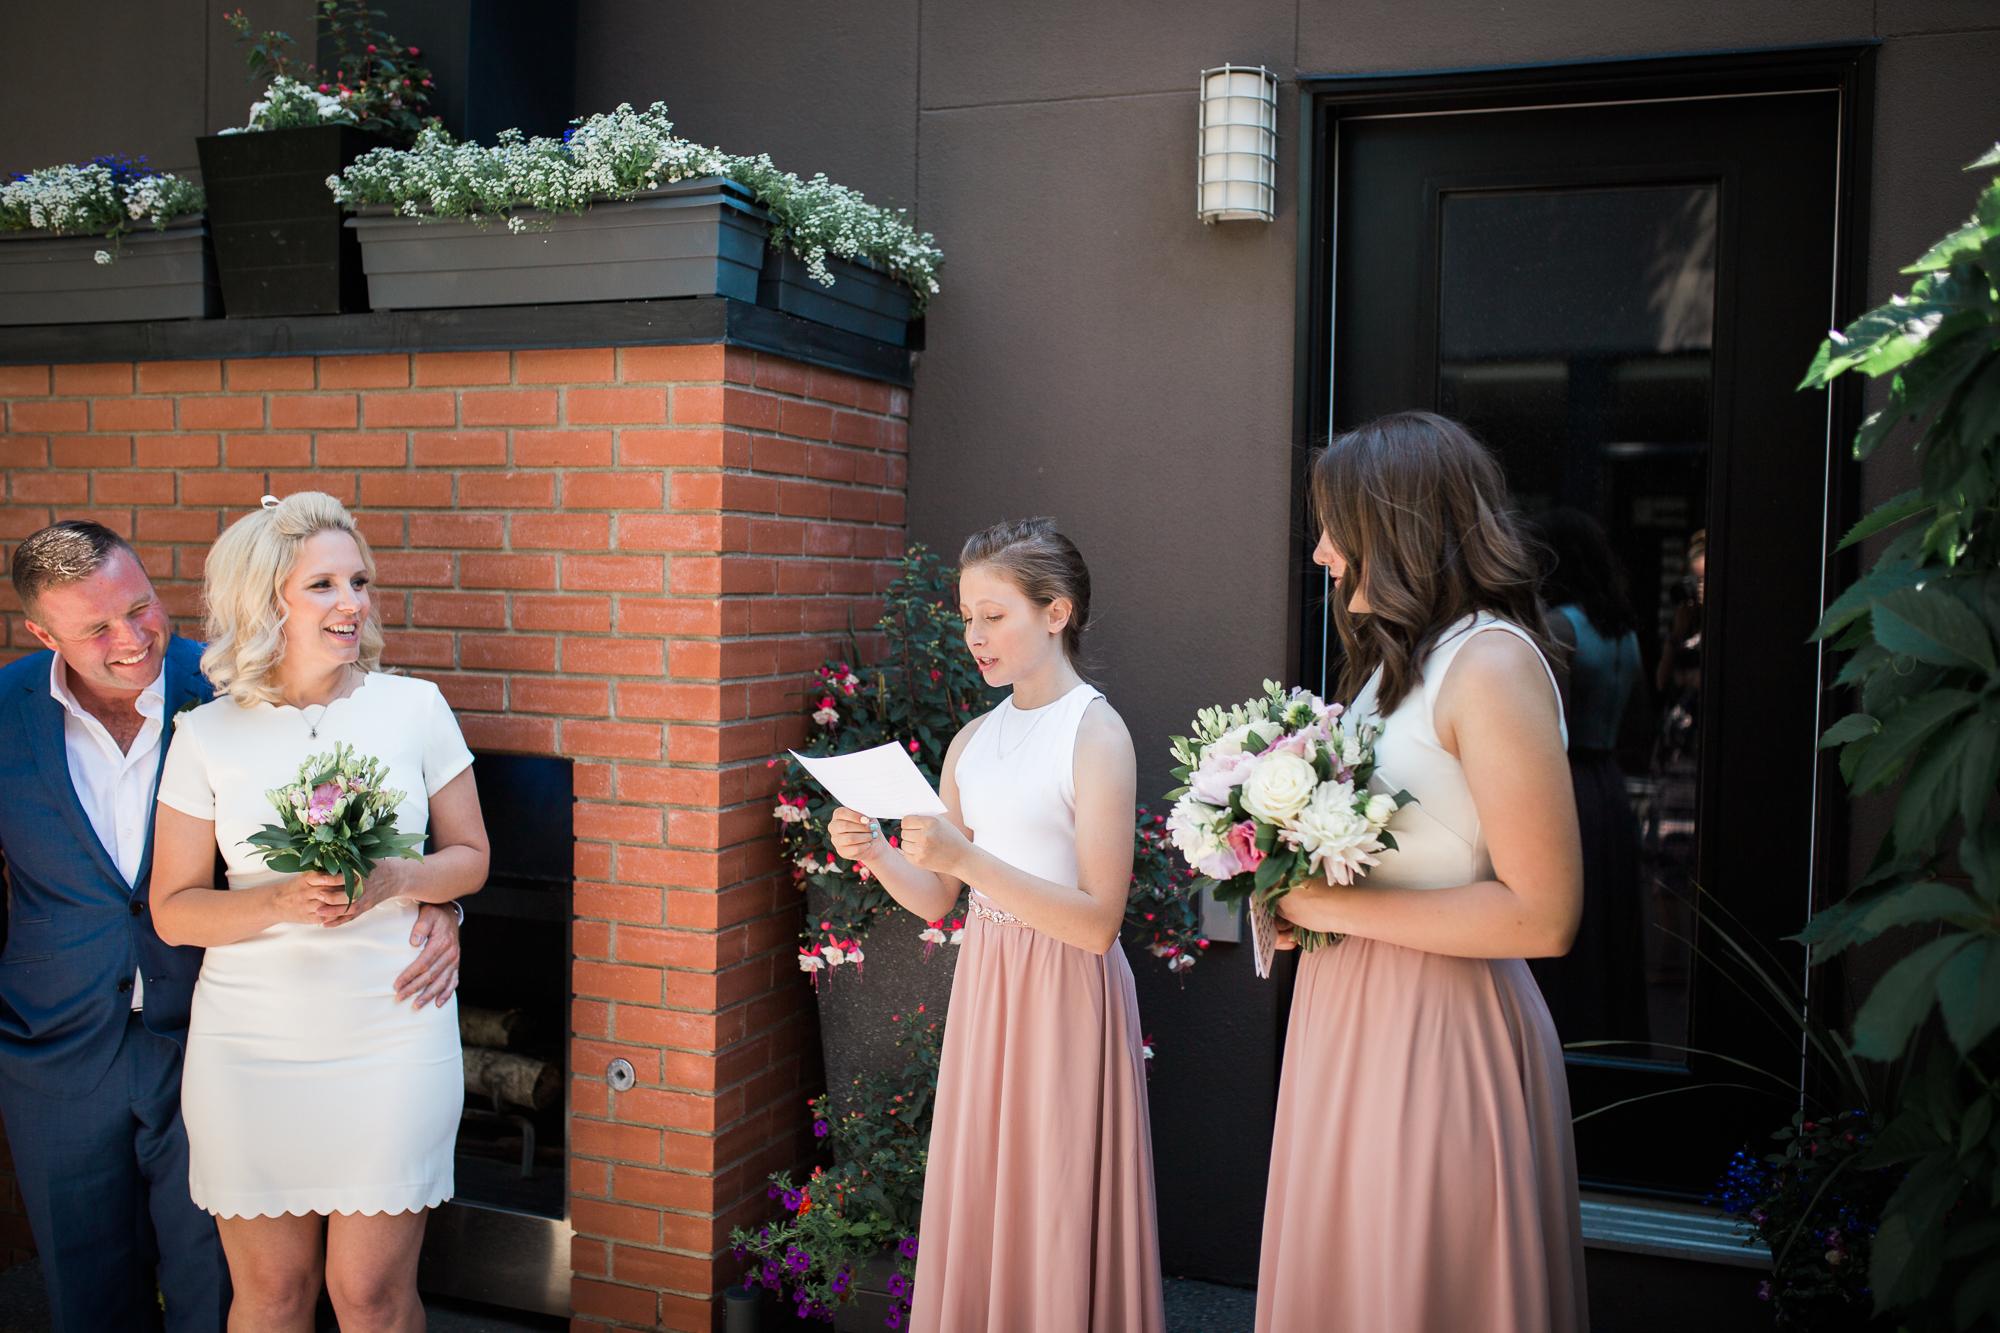 Calgary-wedding-photographer-CG-23.jpg